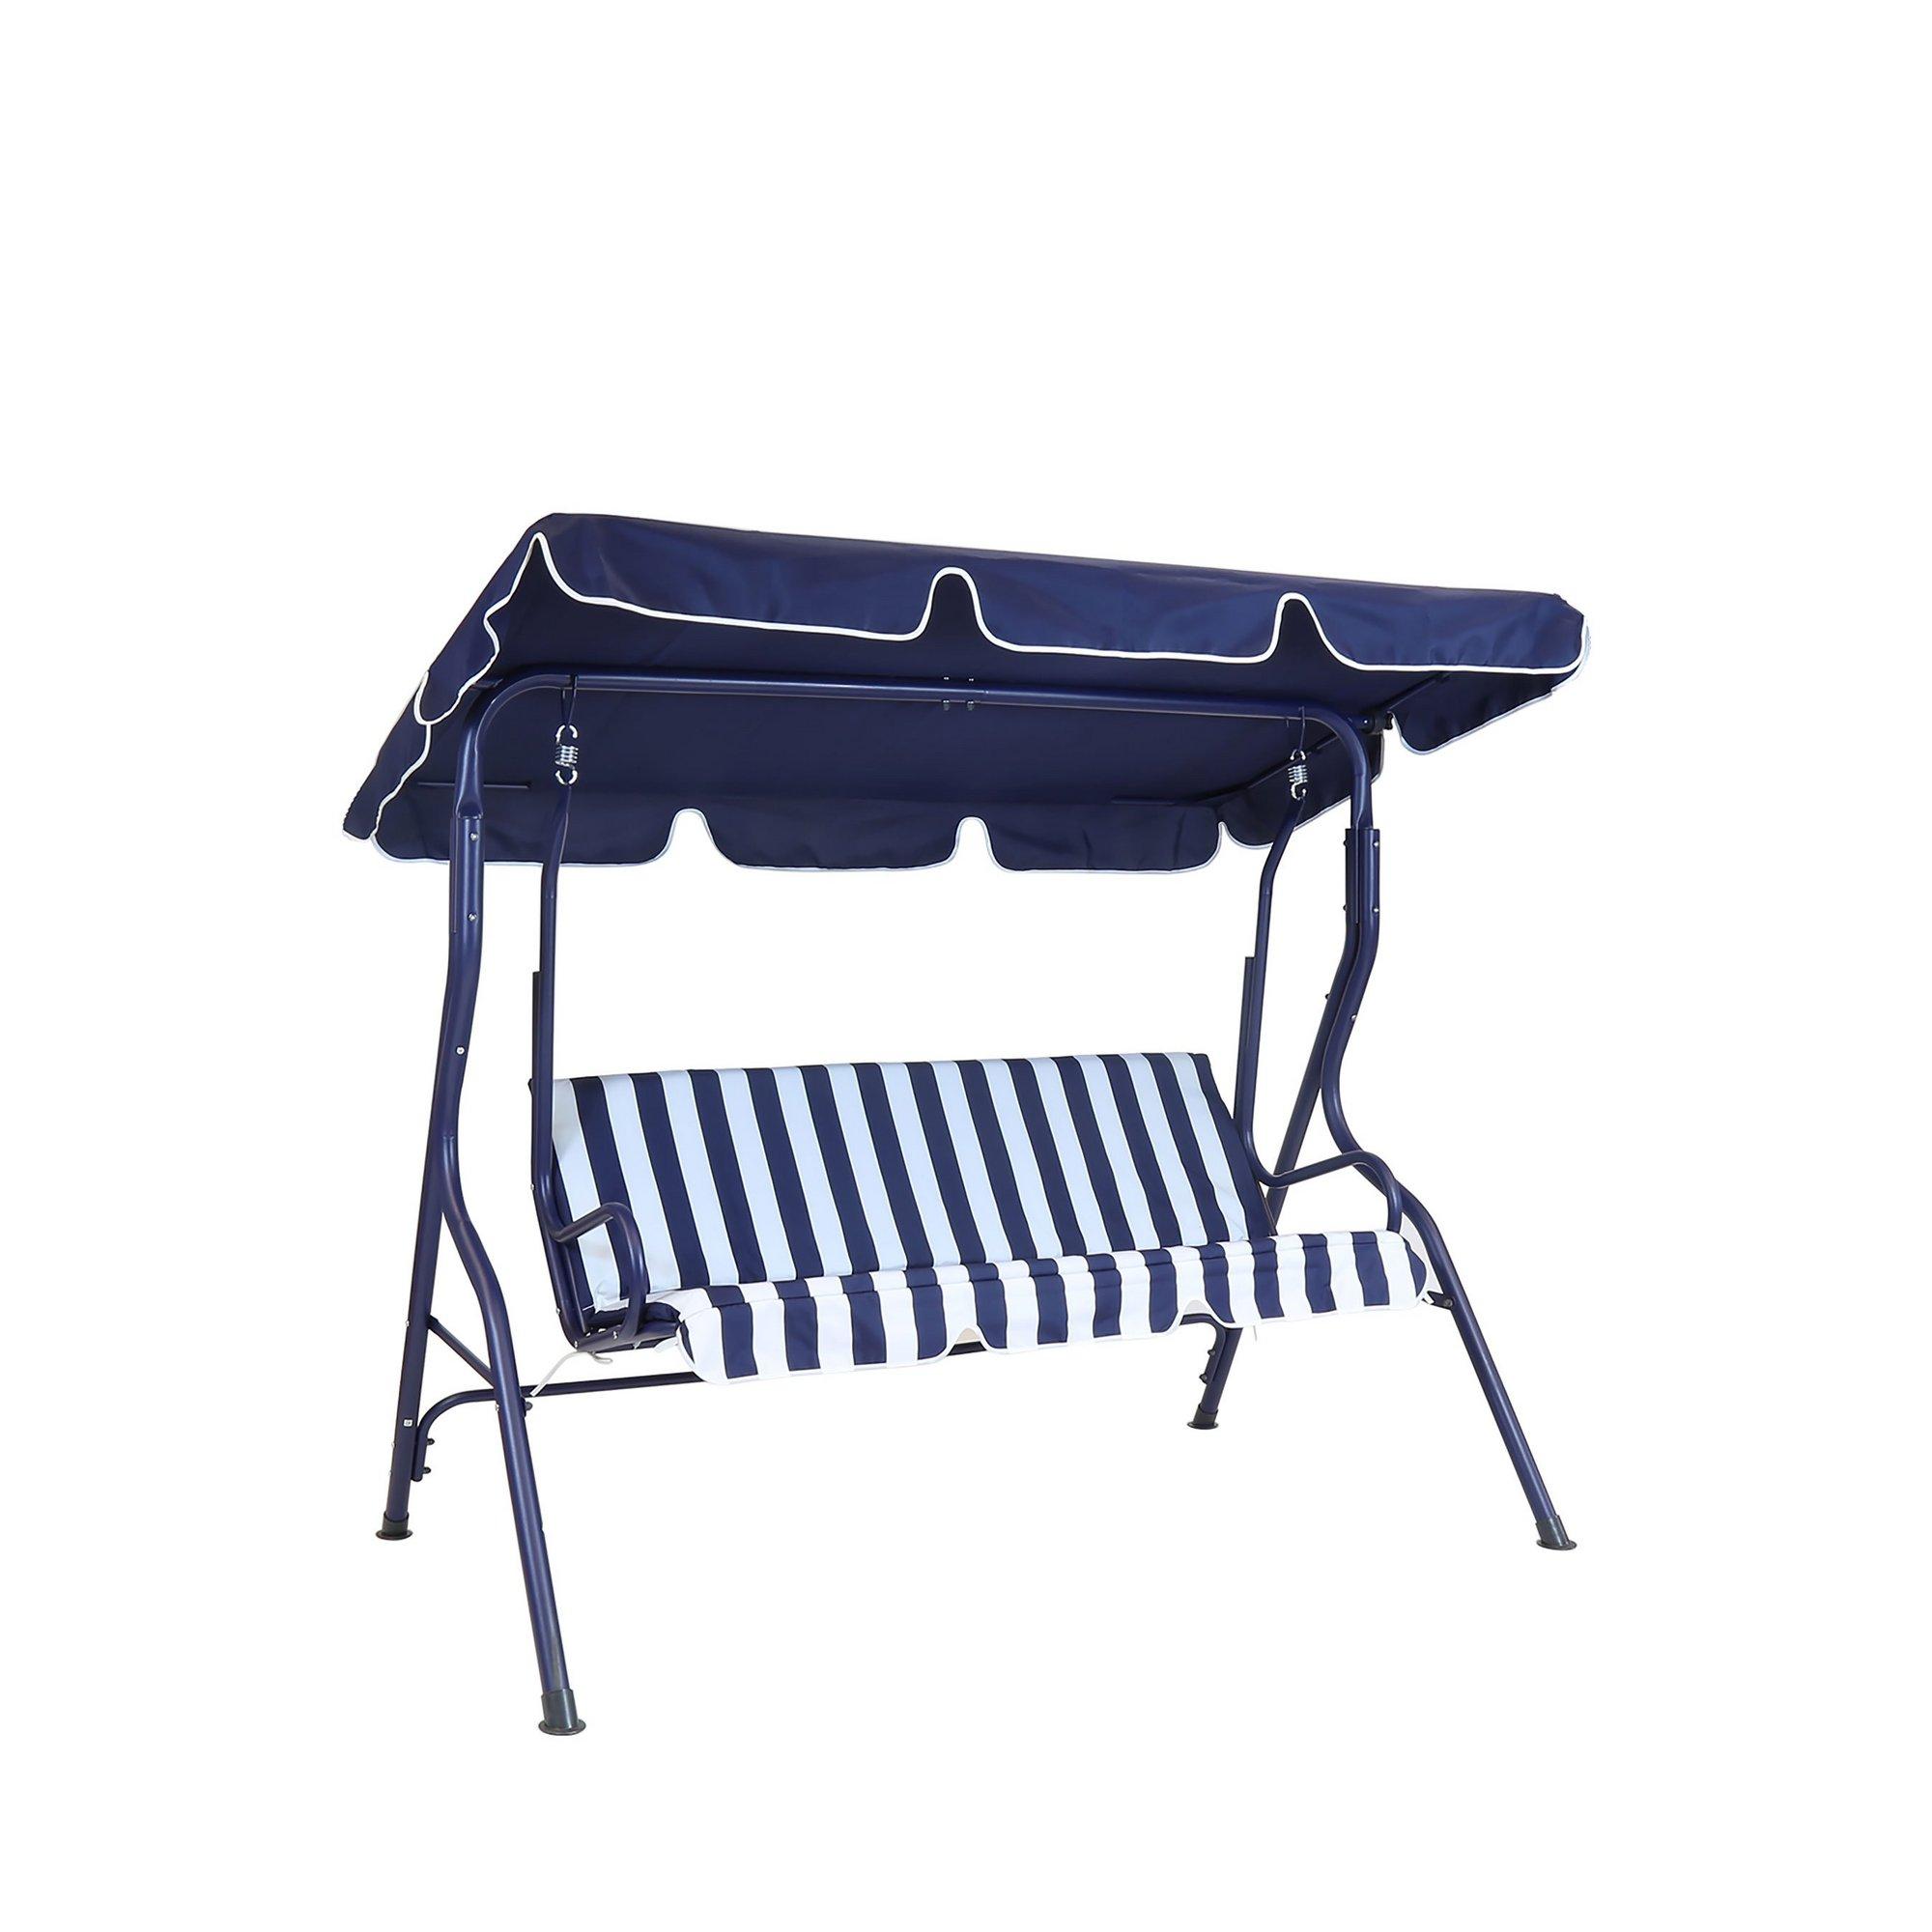 Image of Charles Bentley 2 Seater Garden Swing Seat Hammock Blue Stripe